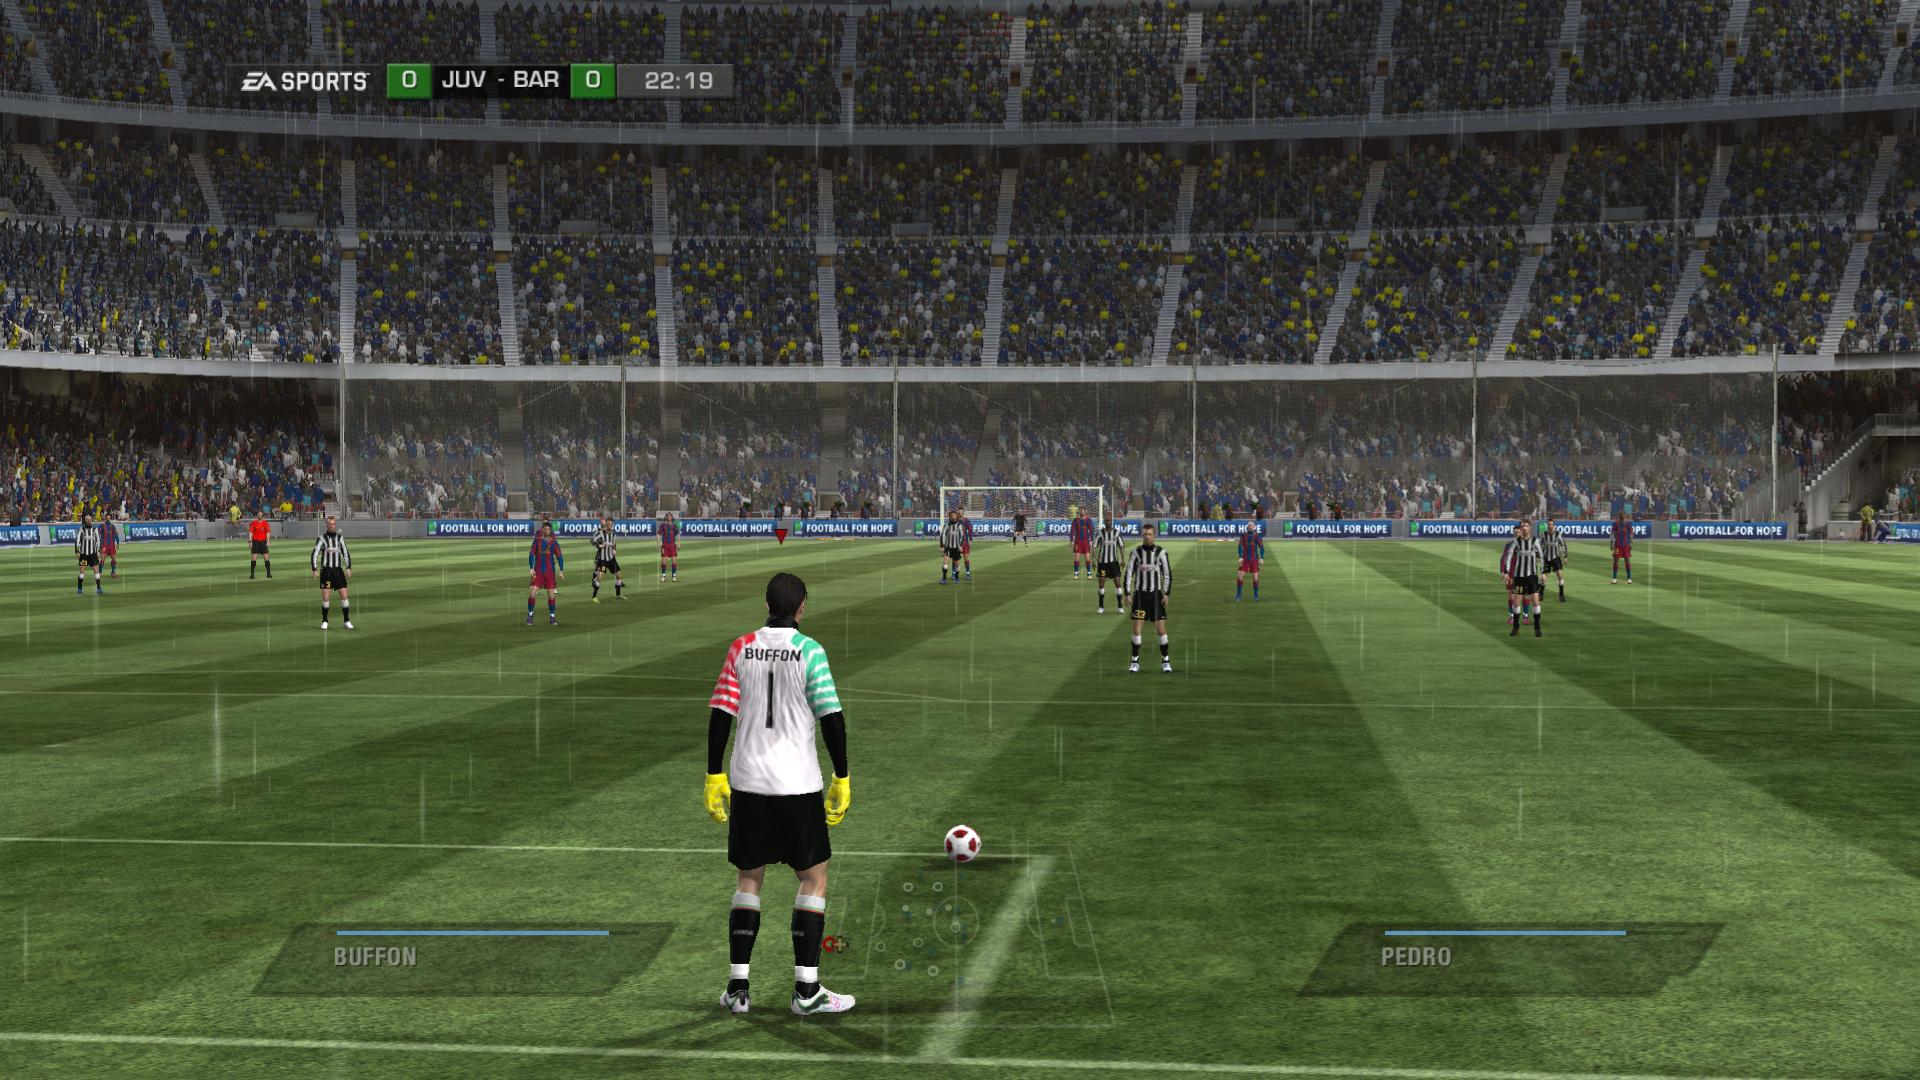 Keep Gloves Puma V1.10 (Gianliigi Buffon) (02) - FIFA 11 Сзади